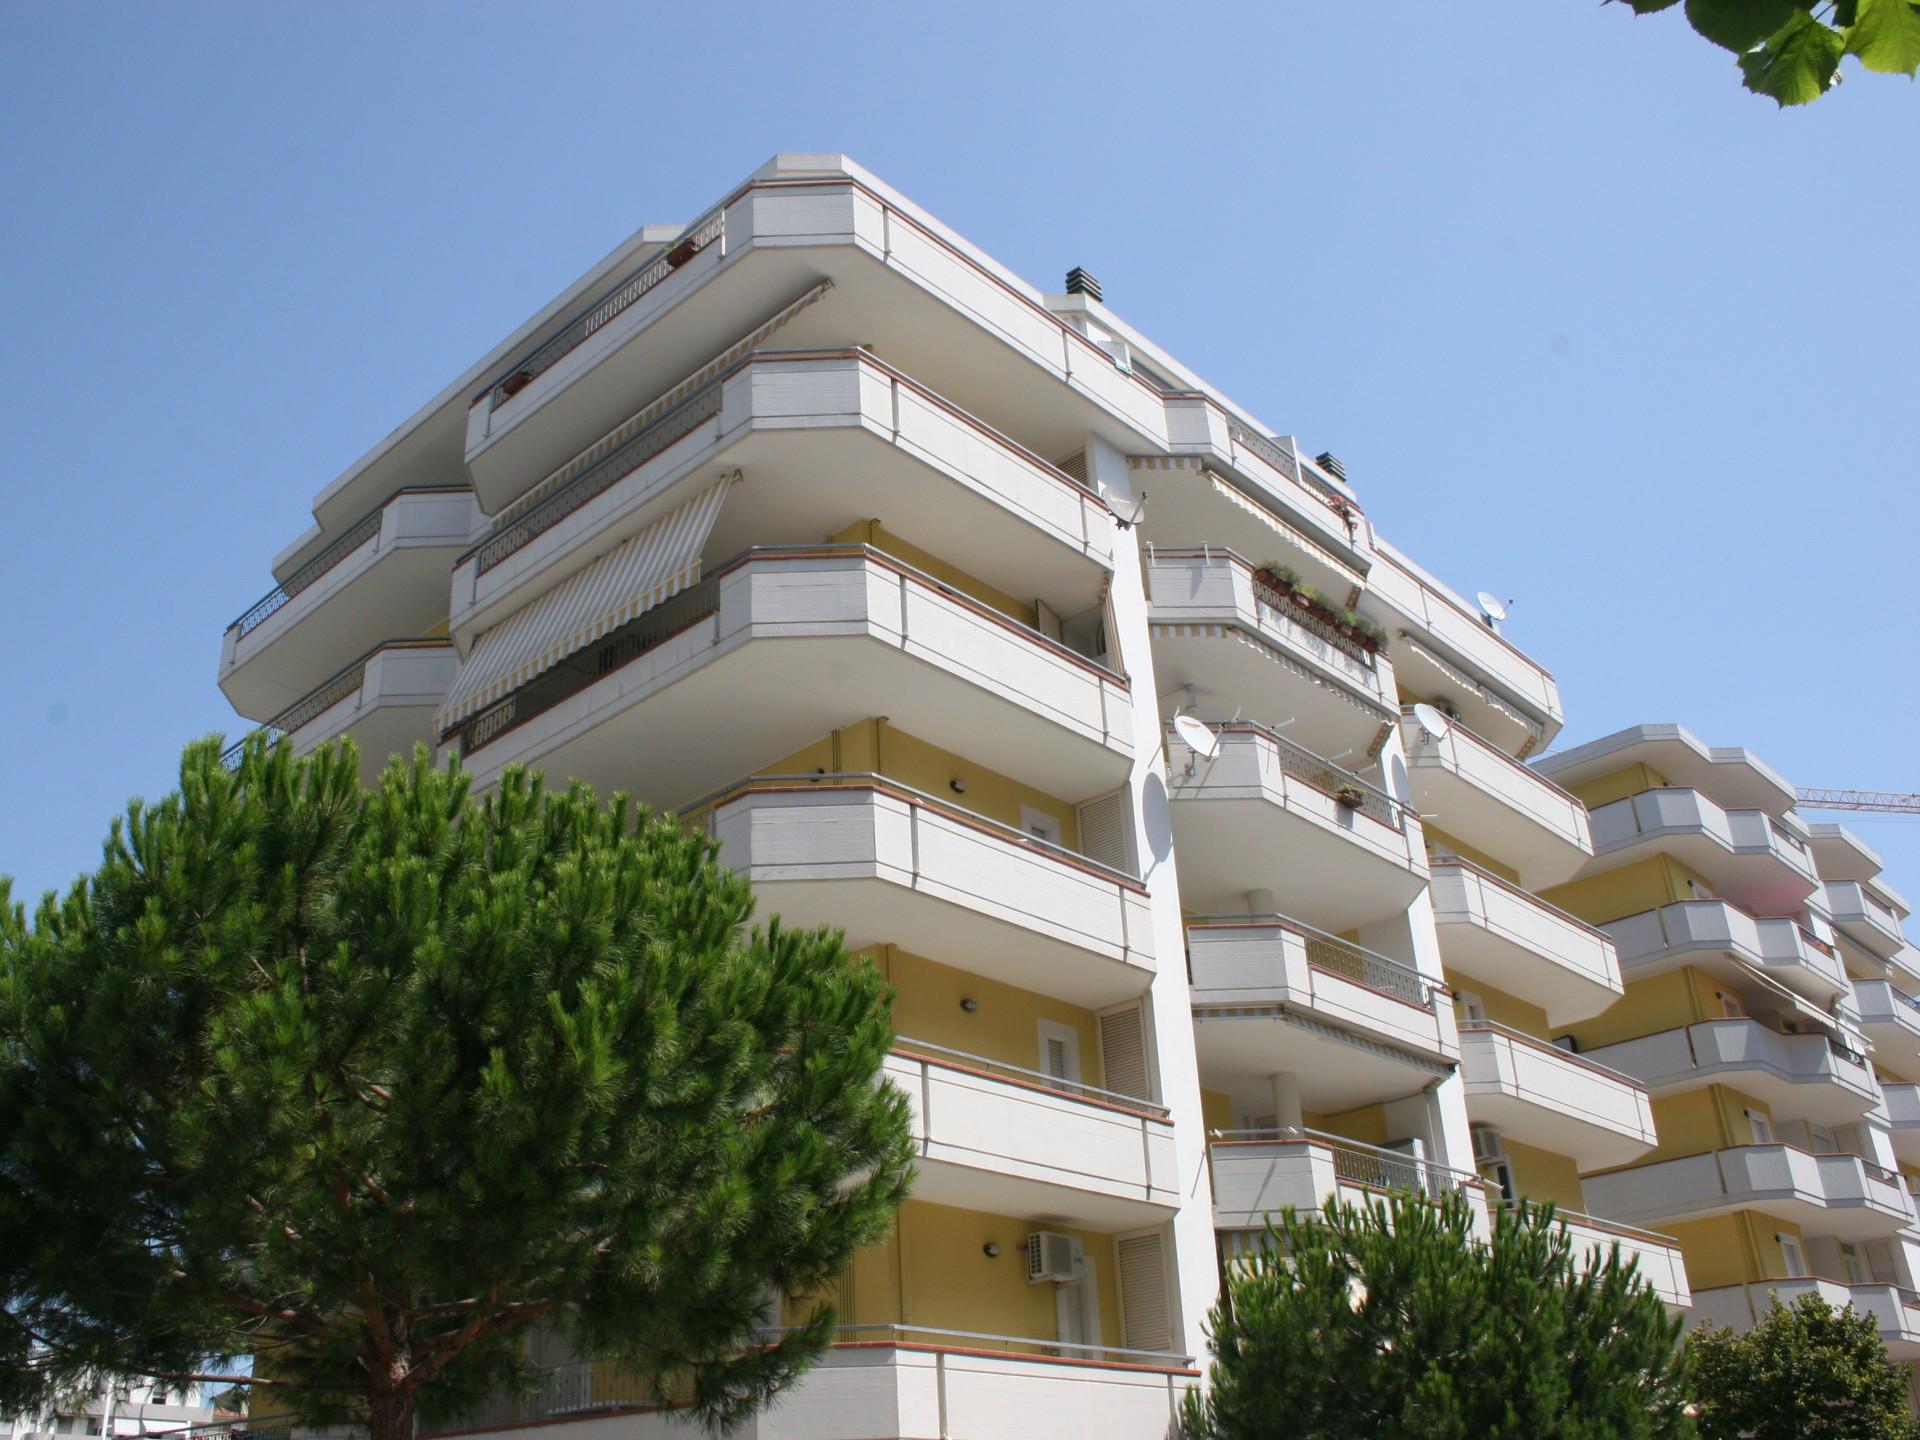 Foto Holiday Club Residence Alba Adriatica 1938 Buick Wiring Diagram